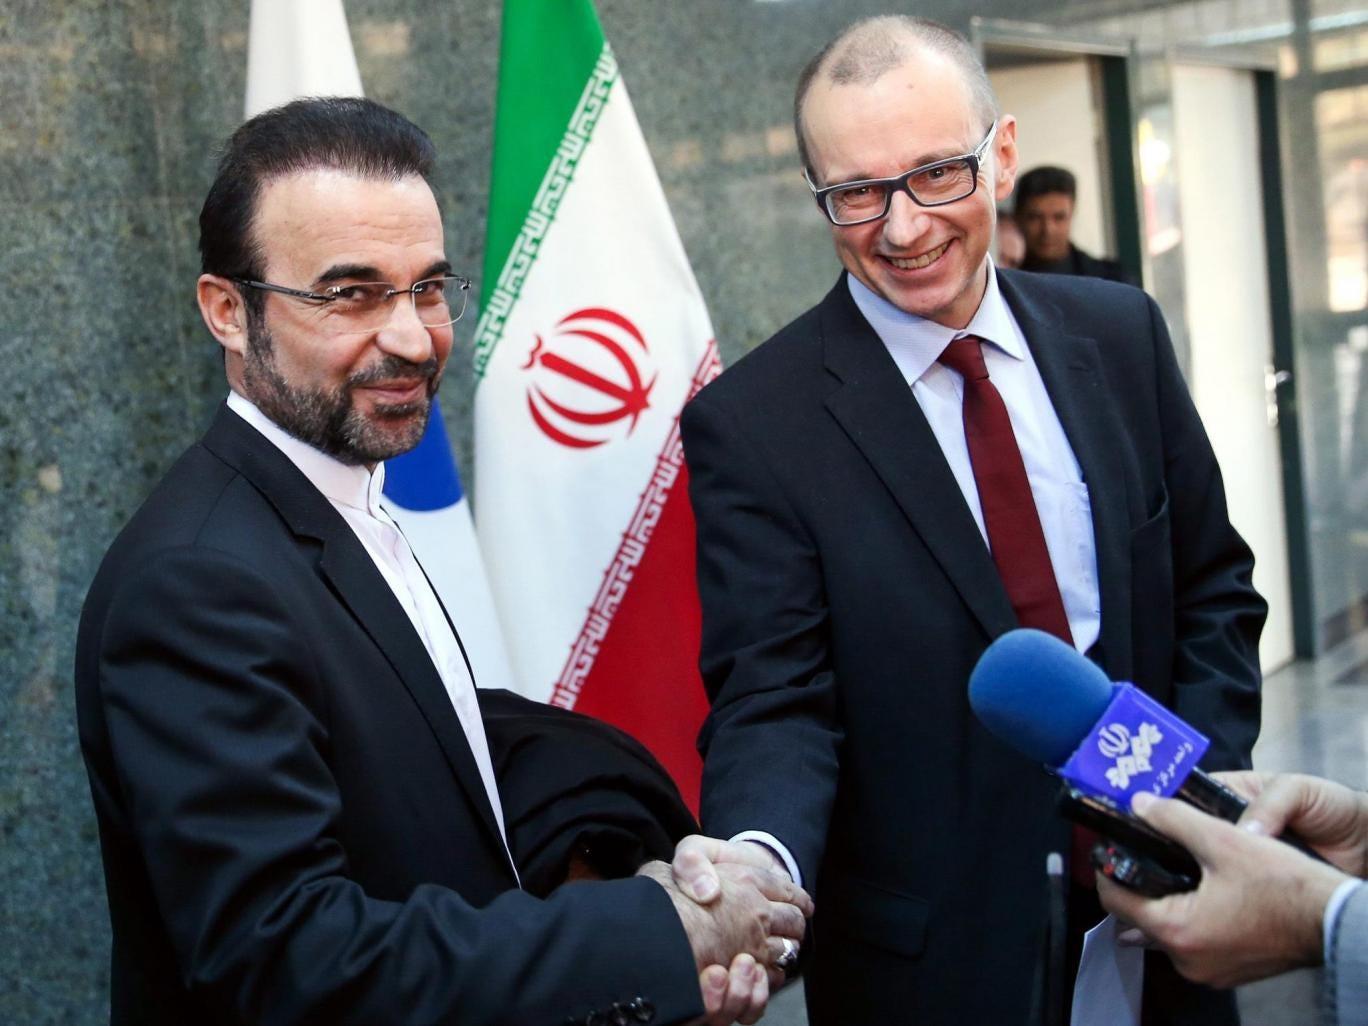 The deputy head of the International Atomic Energy Agency (IAEA), Tero Varjoranta (R), and Iranís IAEA envoy Reza Najafi (L) shake hands after an agreement reached, in Tehran, Iran